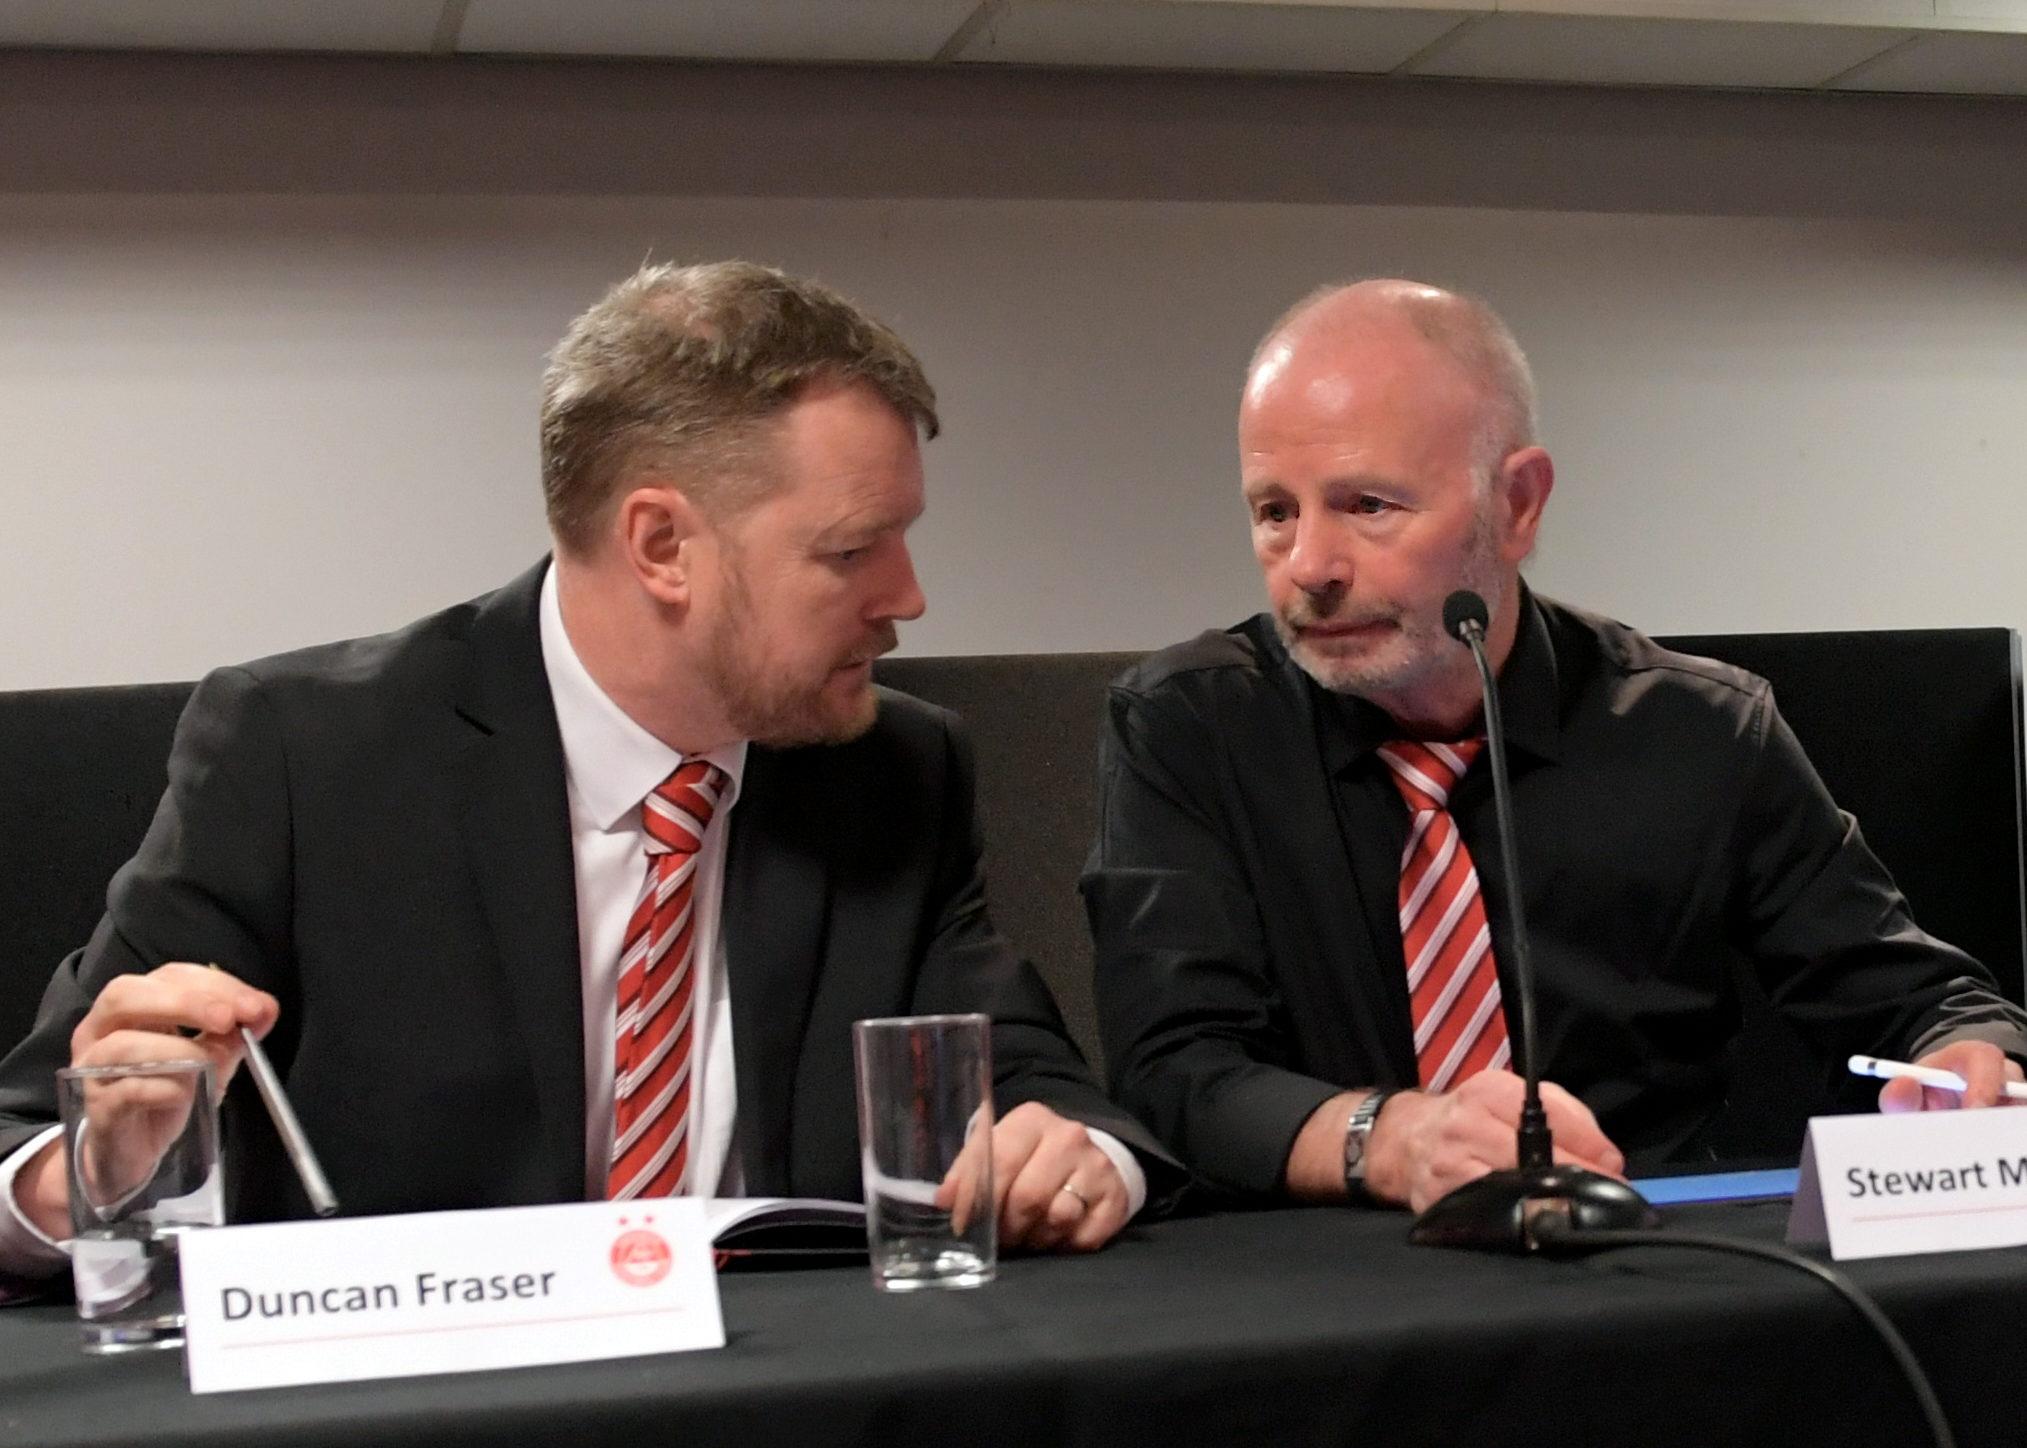 Duncan Fraser with former chairman Stewart Milne